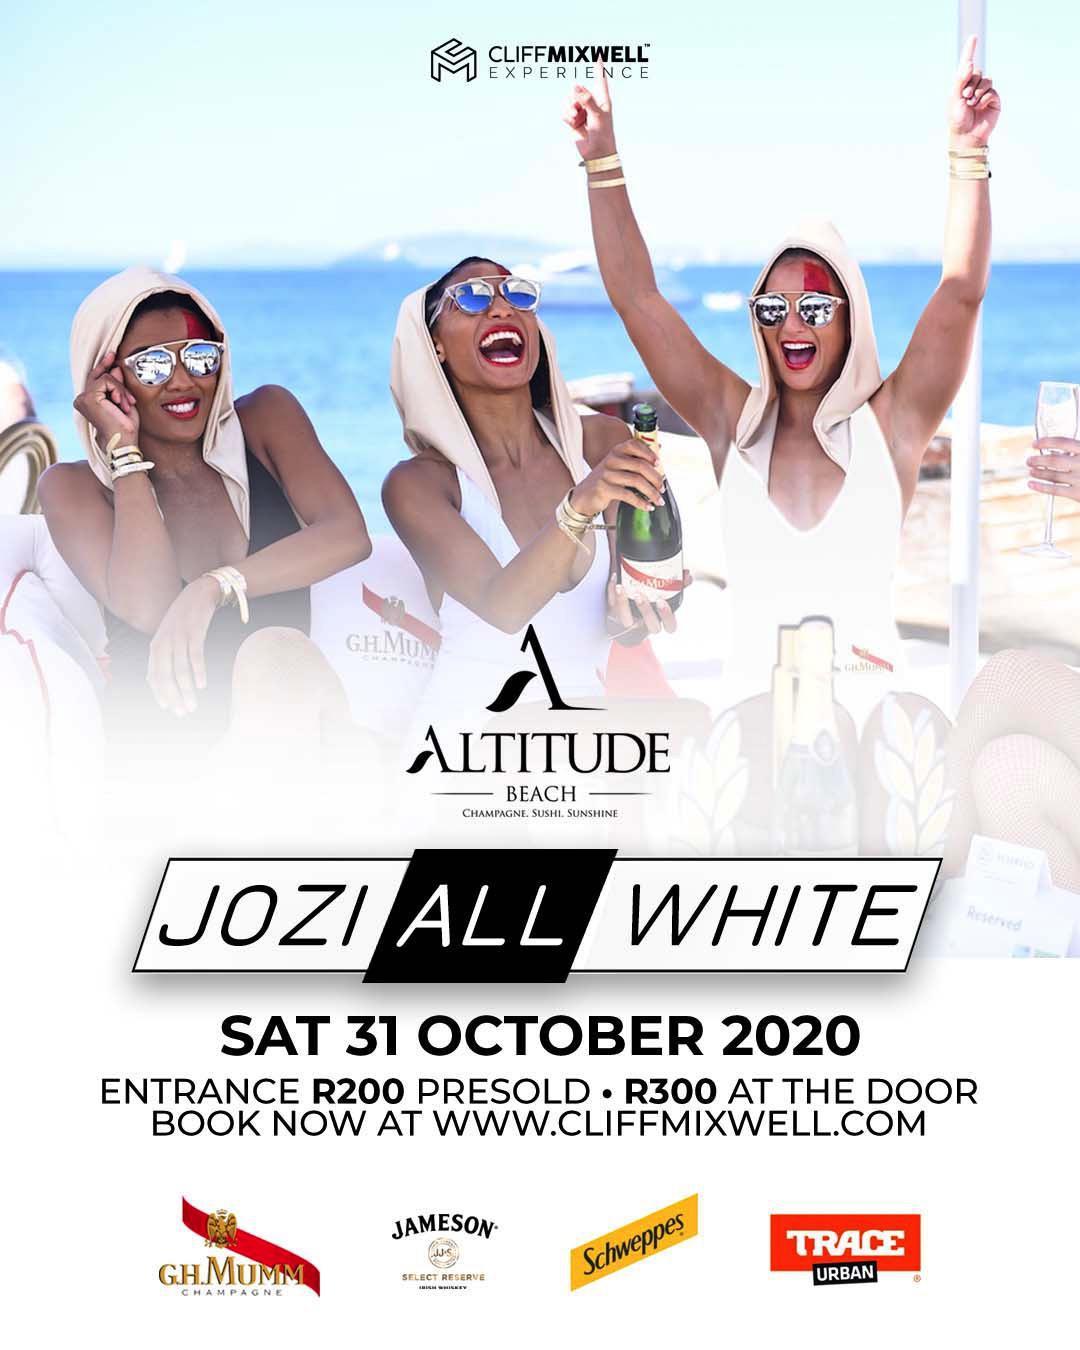 Win 2 VIP Tickets to Jozi All White at Altitude